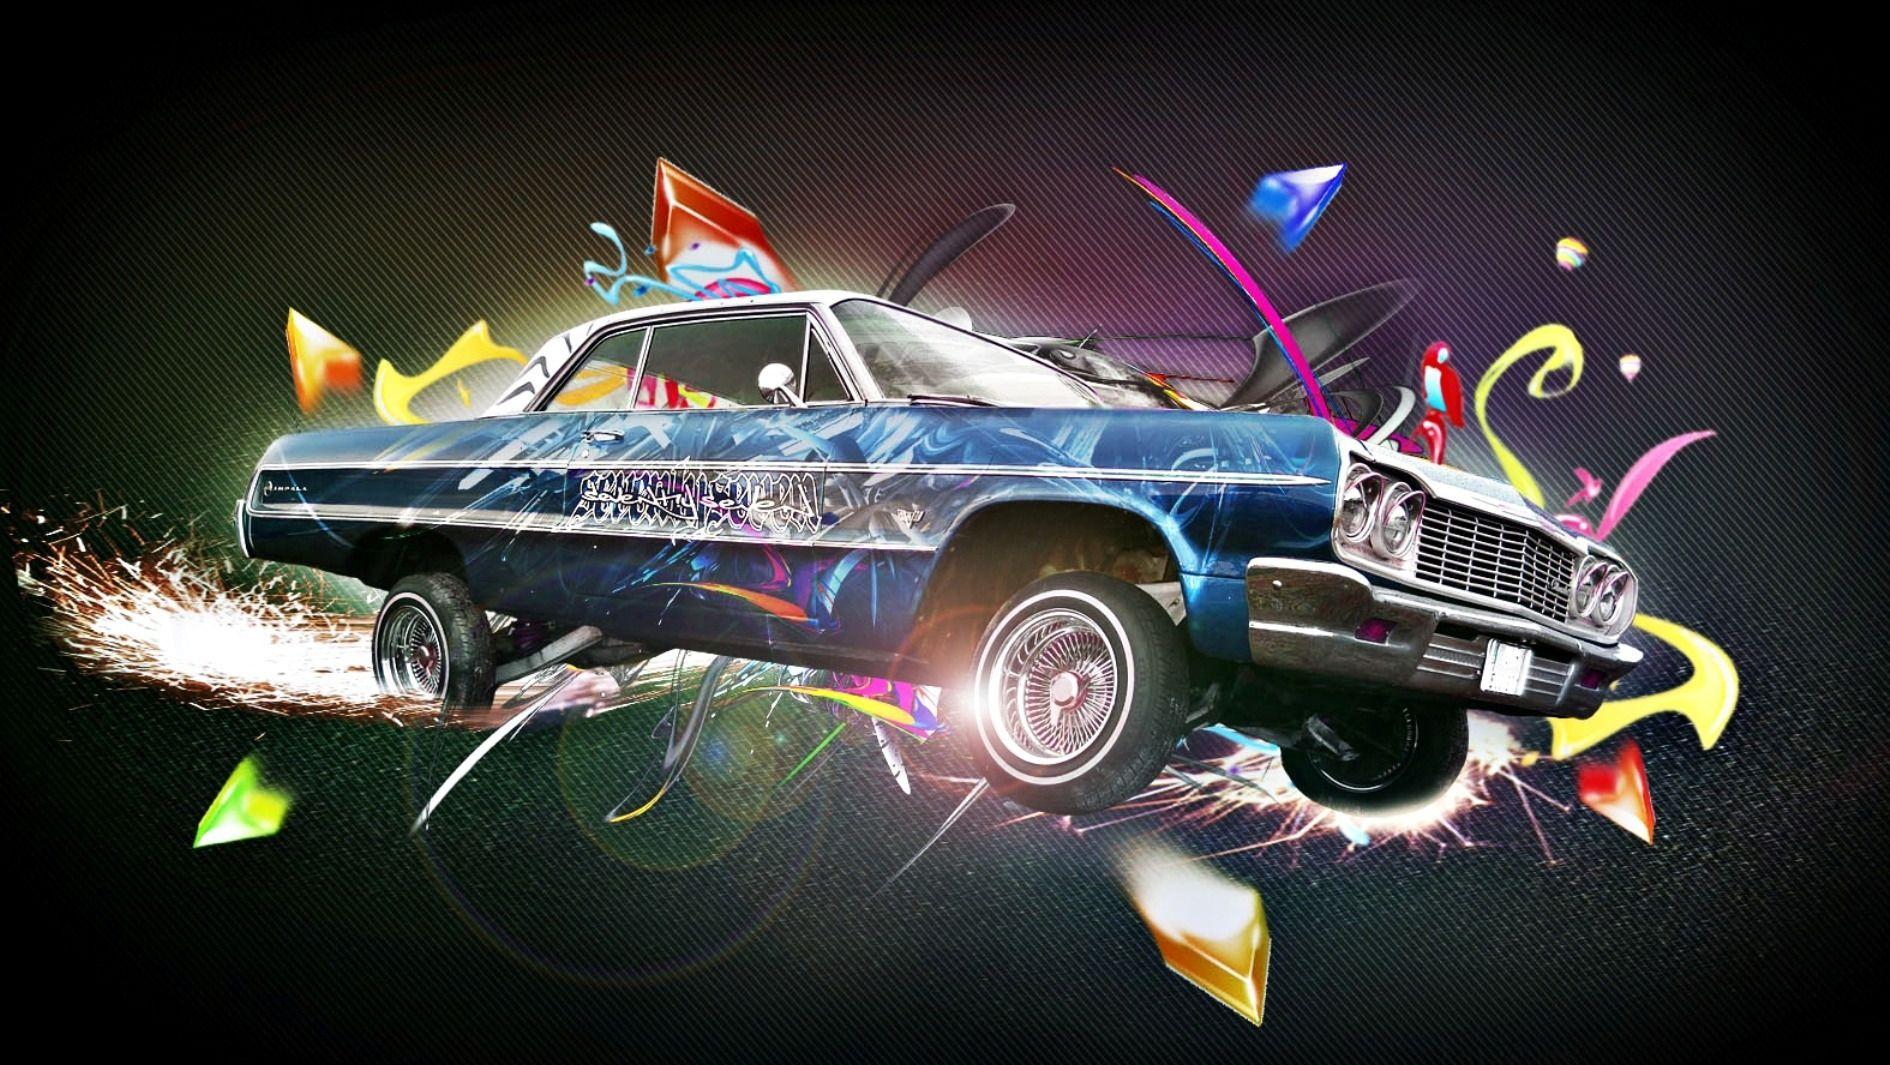 Blue 1964 Impala Lowrider And Graphics Hd Wallpaper Lowrider Cars Lowriders Car Wallpapers